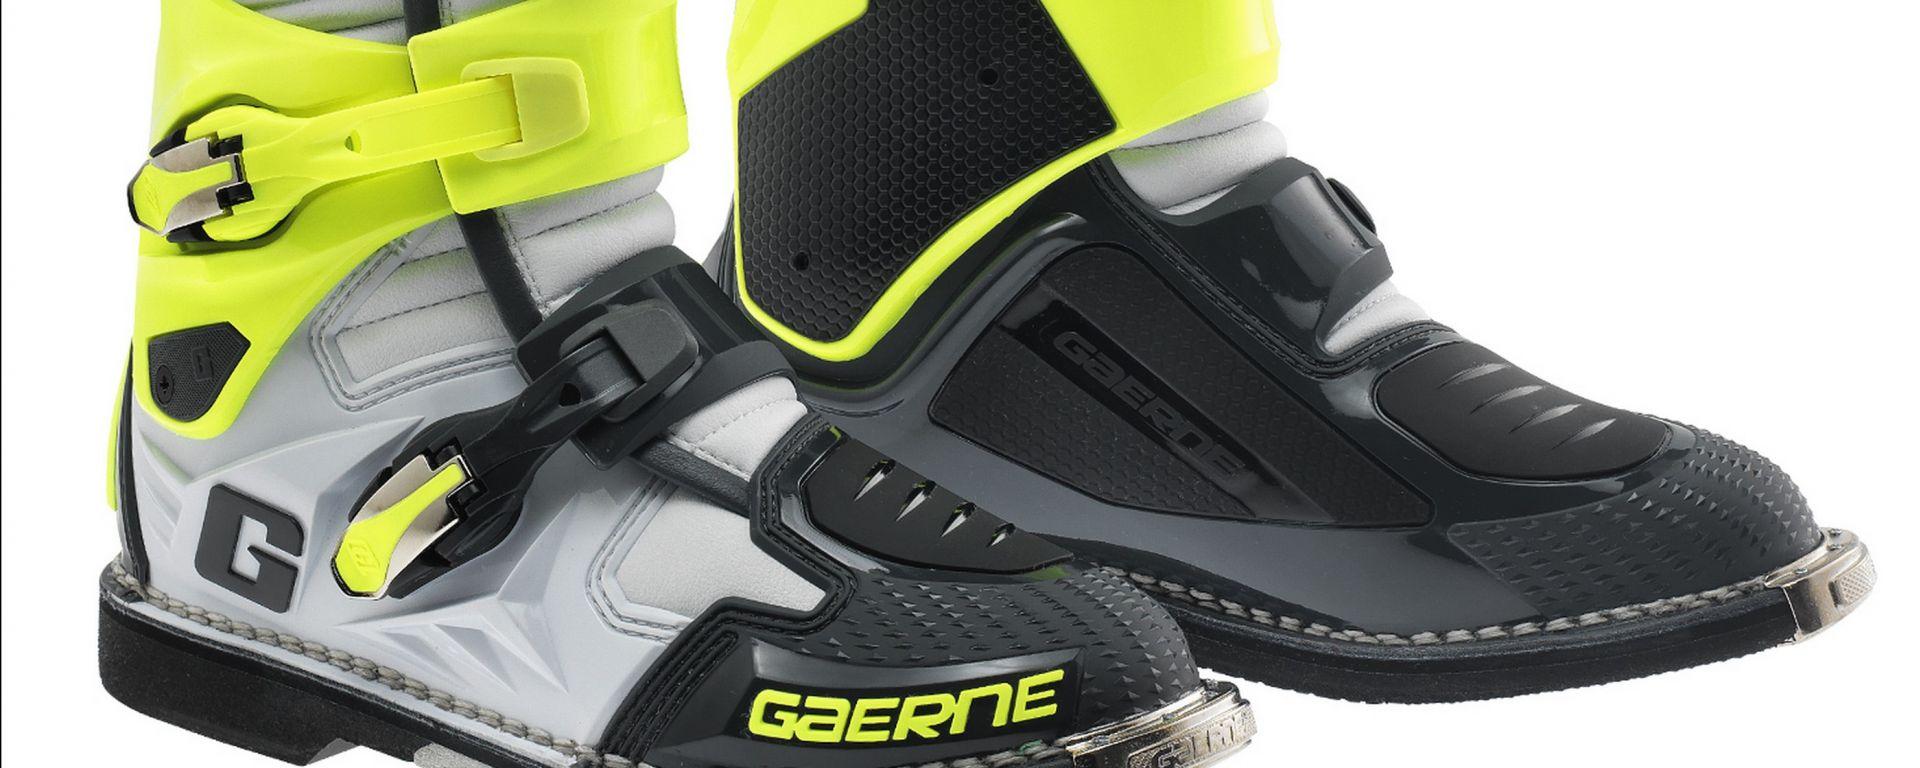 gaerne stivali moto  Abbigliamento moto : Gaerne: stivale SG.12 Grey-Yellow Fluo Limited ...